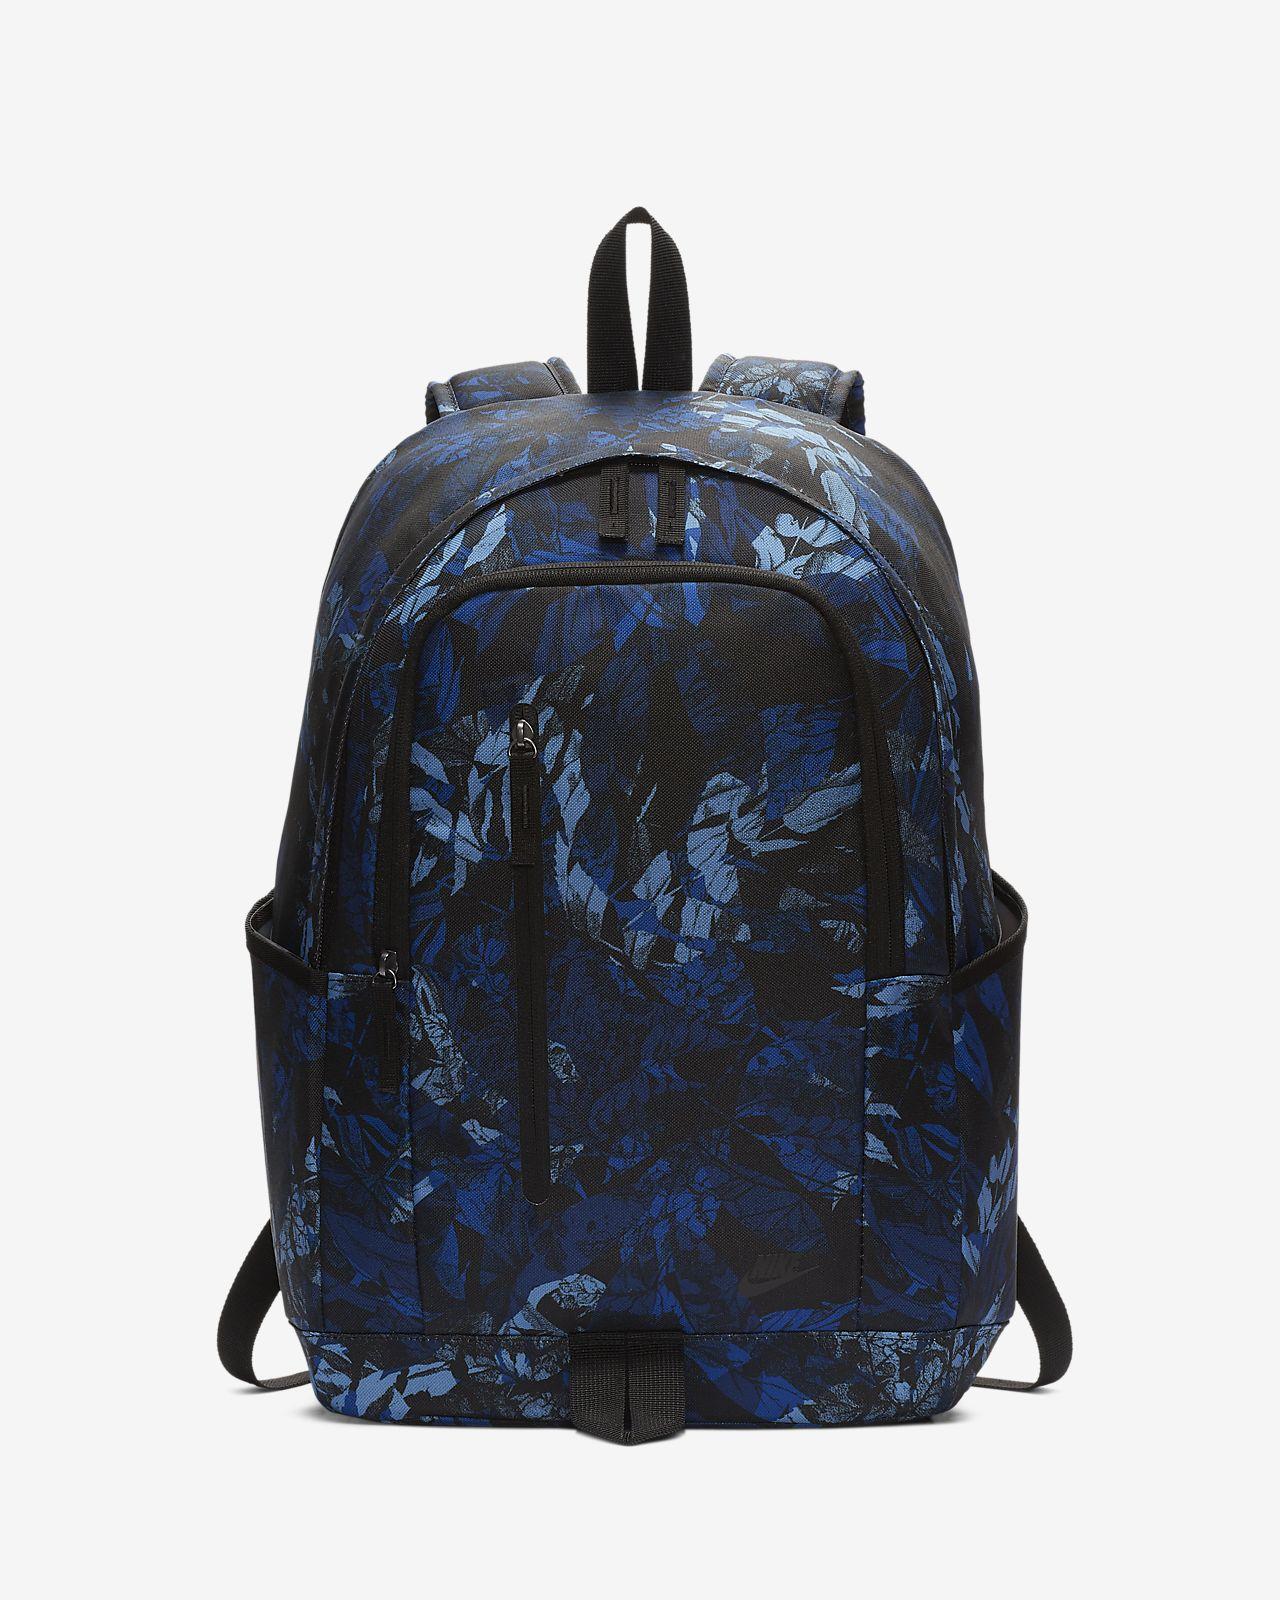 c77ccf8a46ce2 Nike All Access Soleday Printed Backpack. Nike.com ID